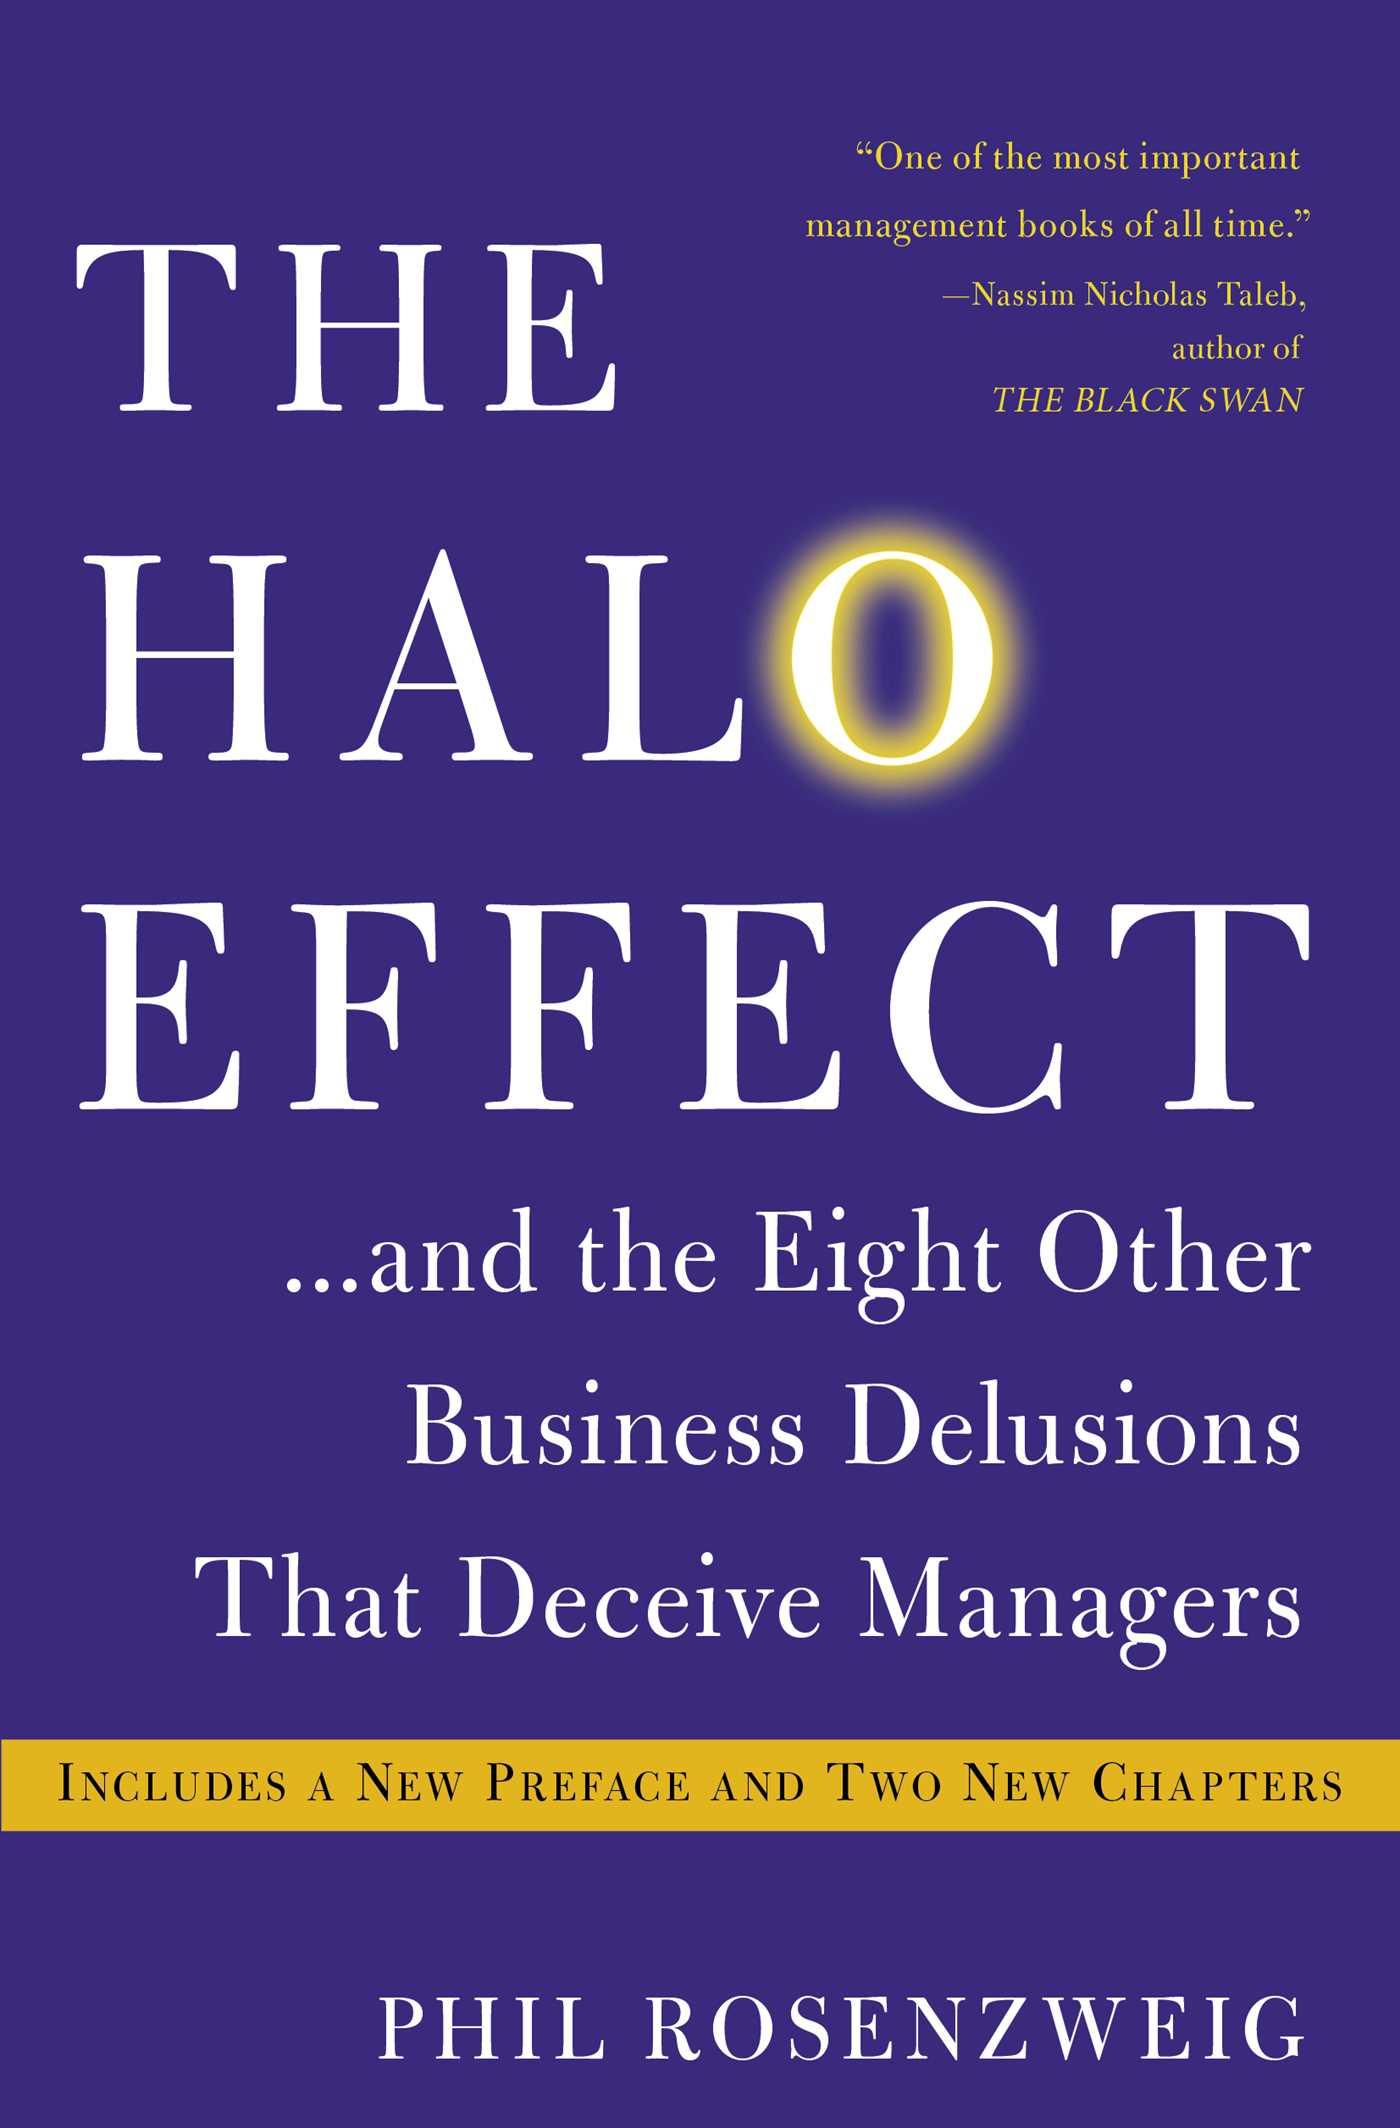 Halo effect 9781476784038 hr